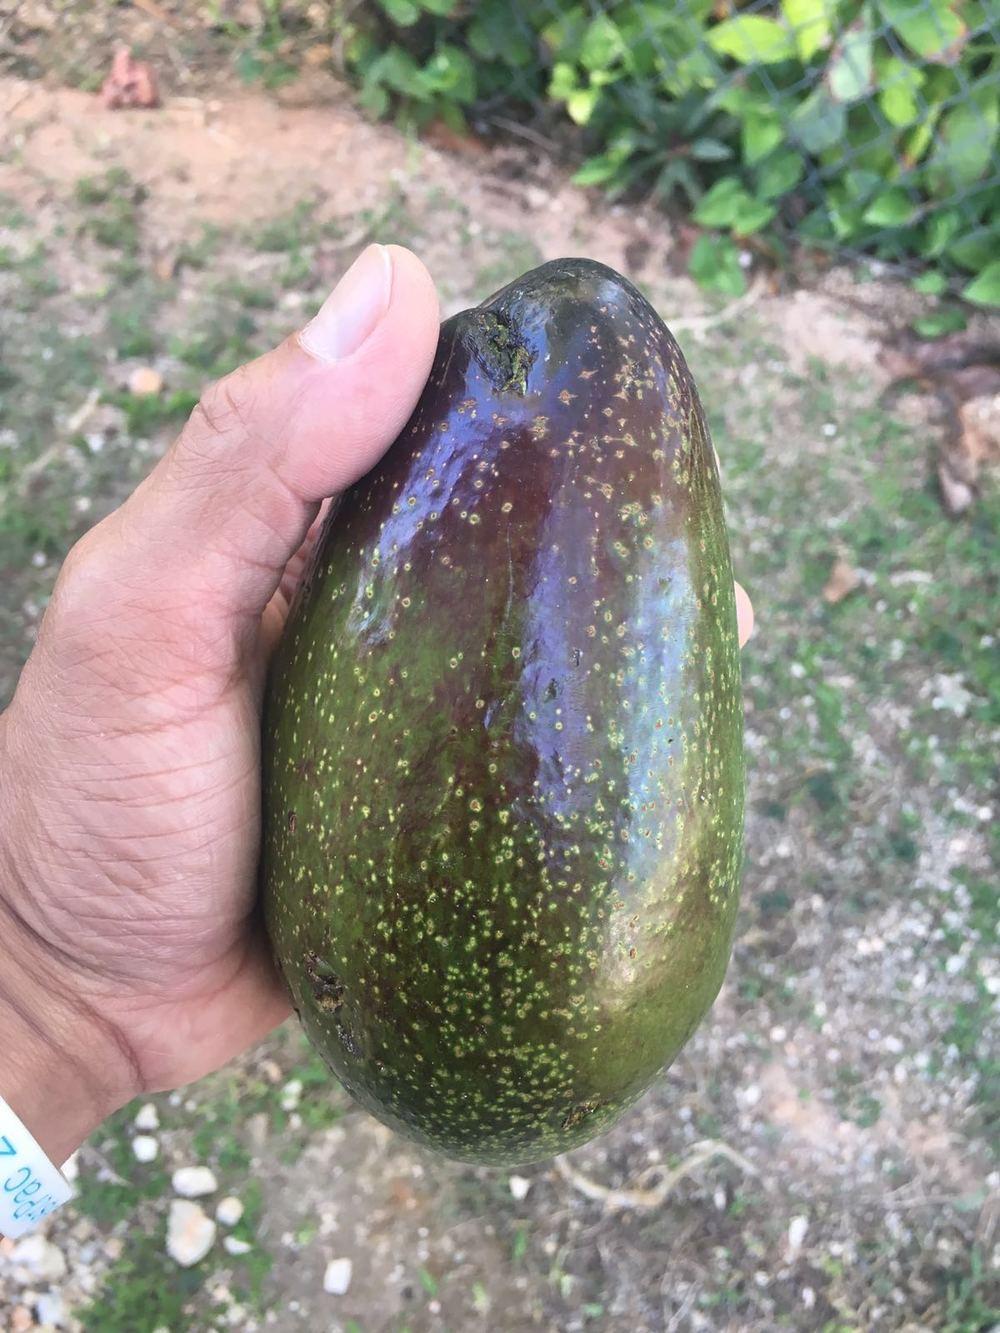 The morning's harvest - fresh avocado